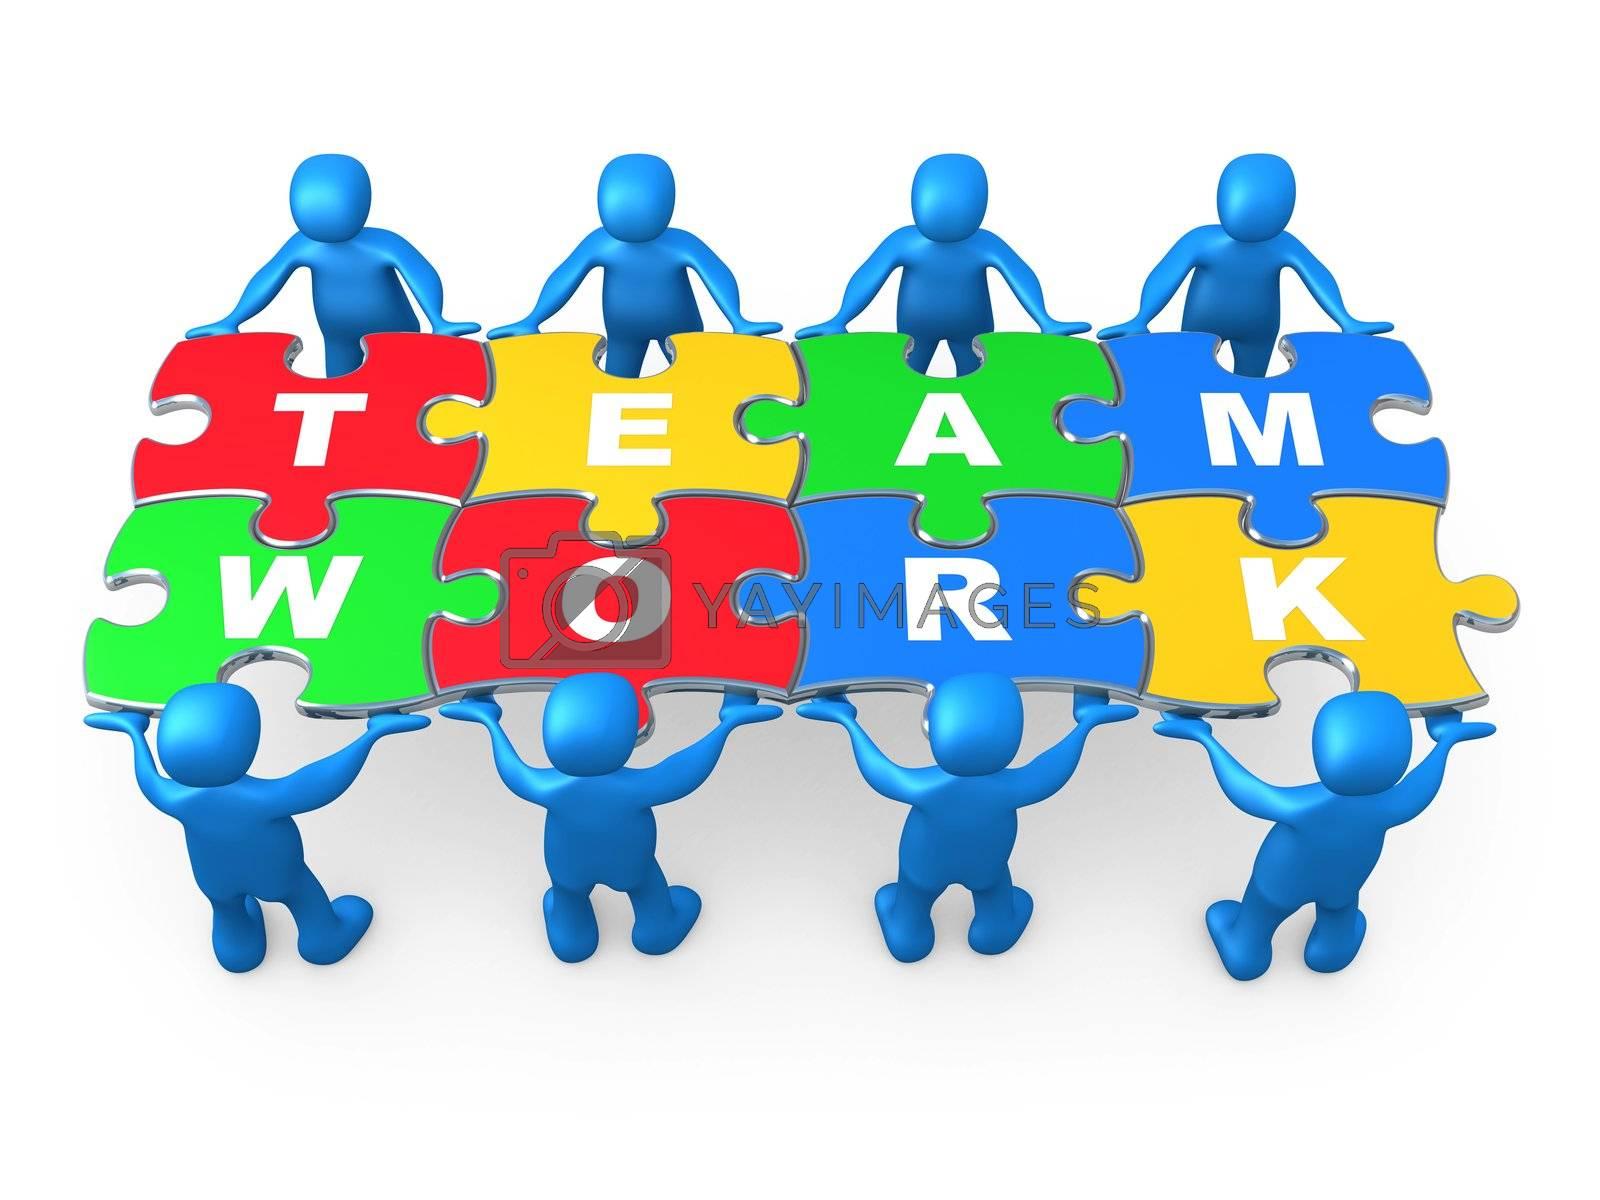 Teamwork by 3pod